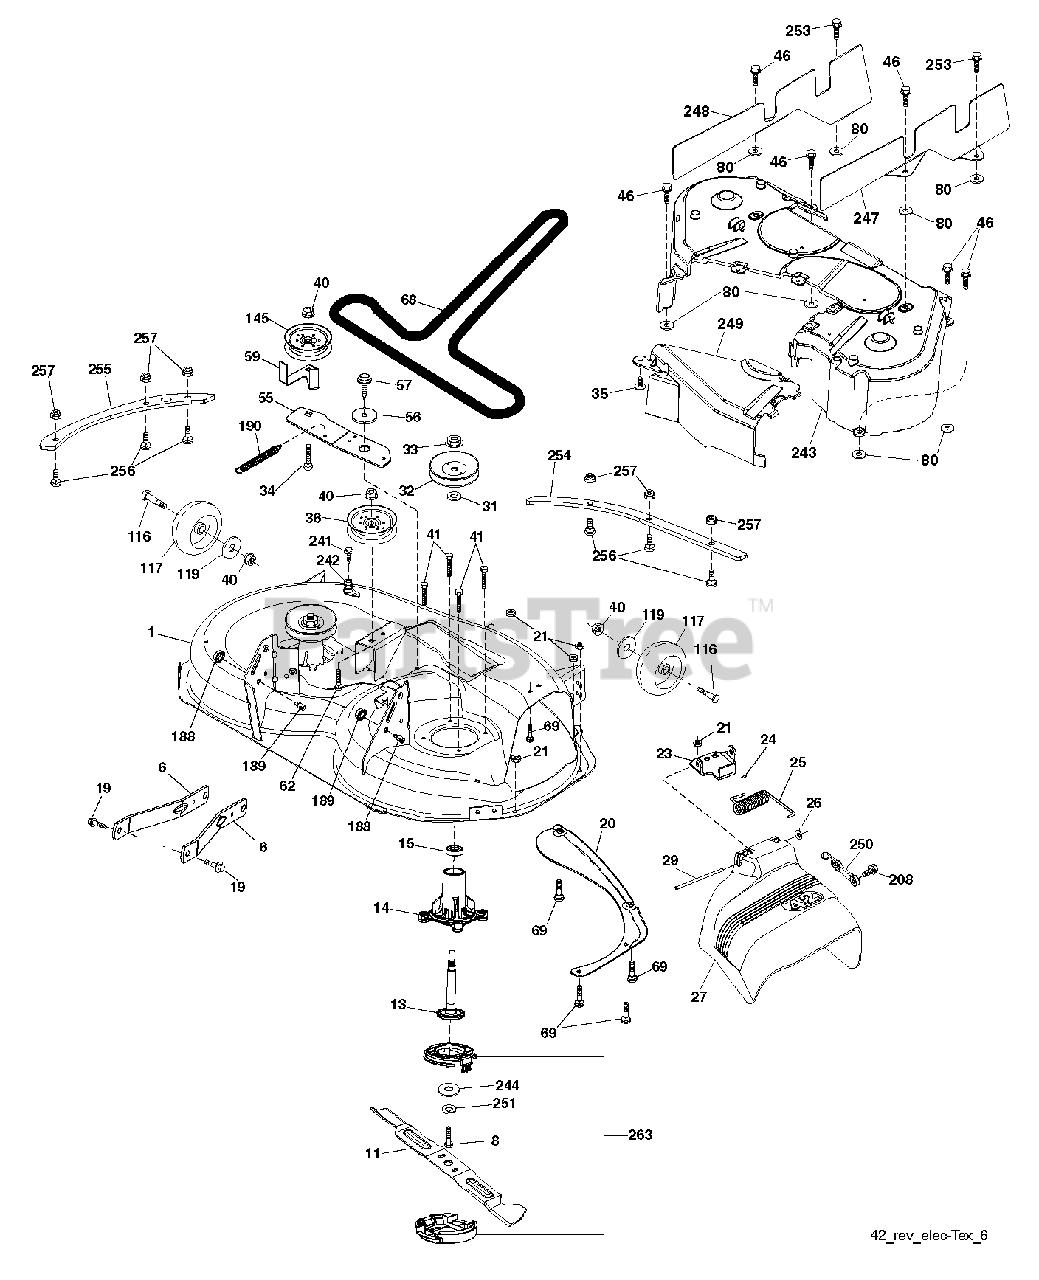 Schraube für Stützrad am Mähwerk passend Husqvarna TC342T 960510148 Rasentraktor